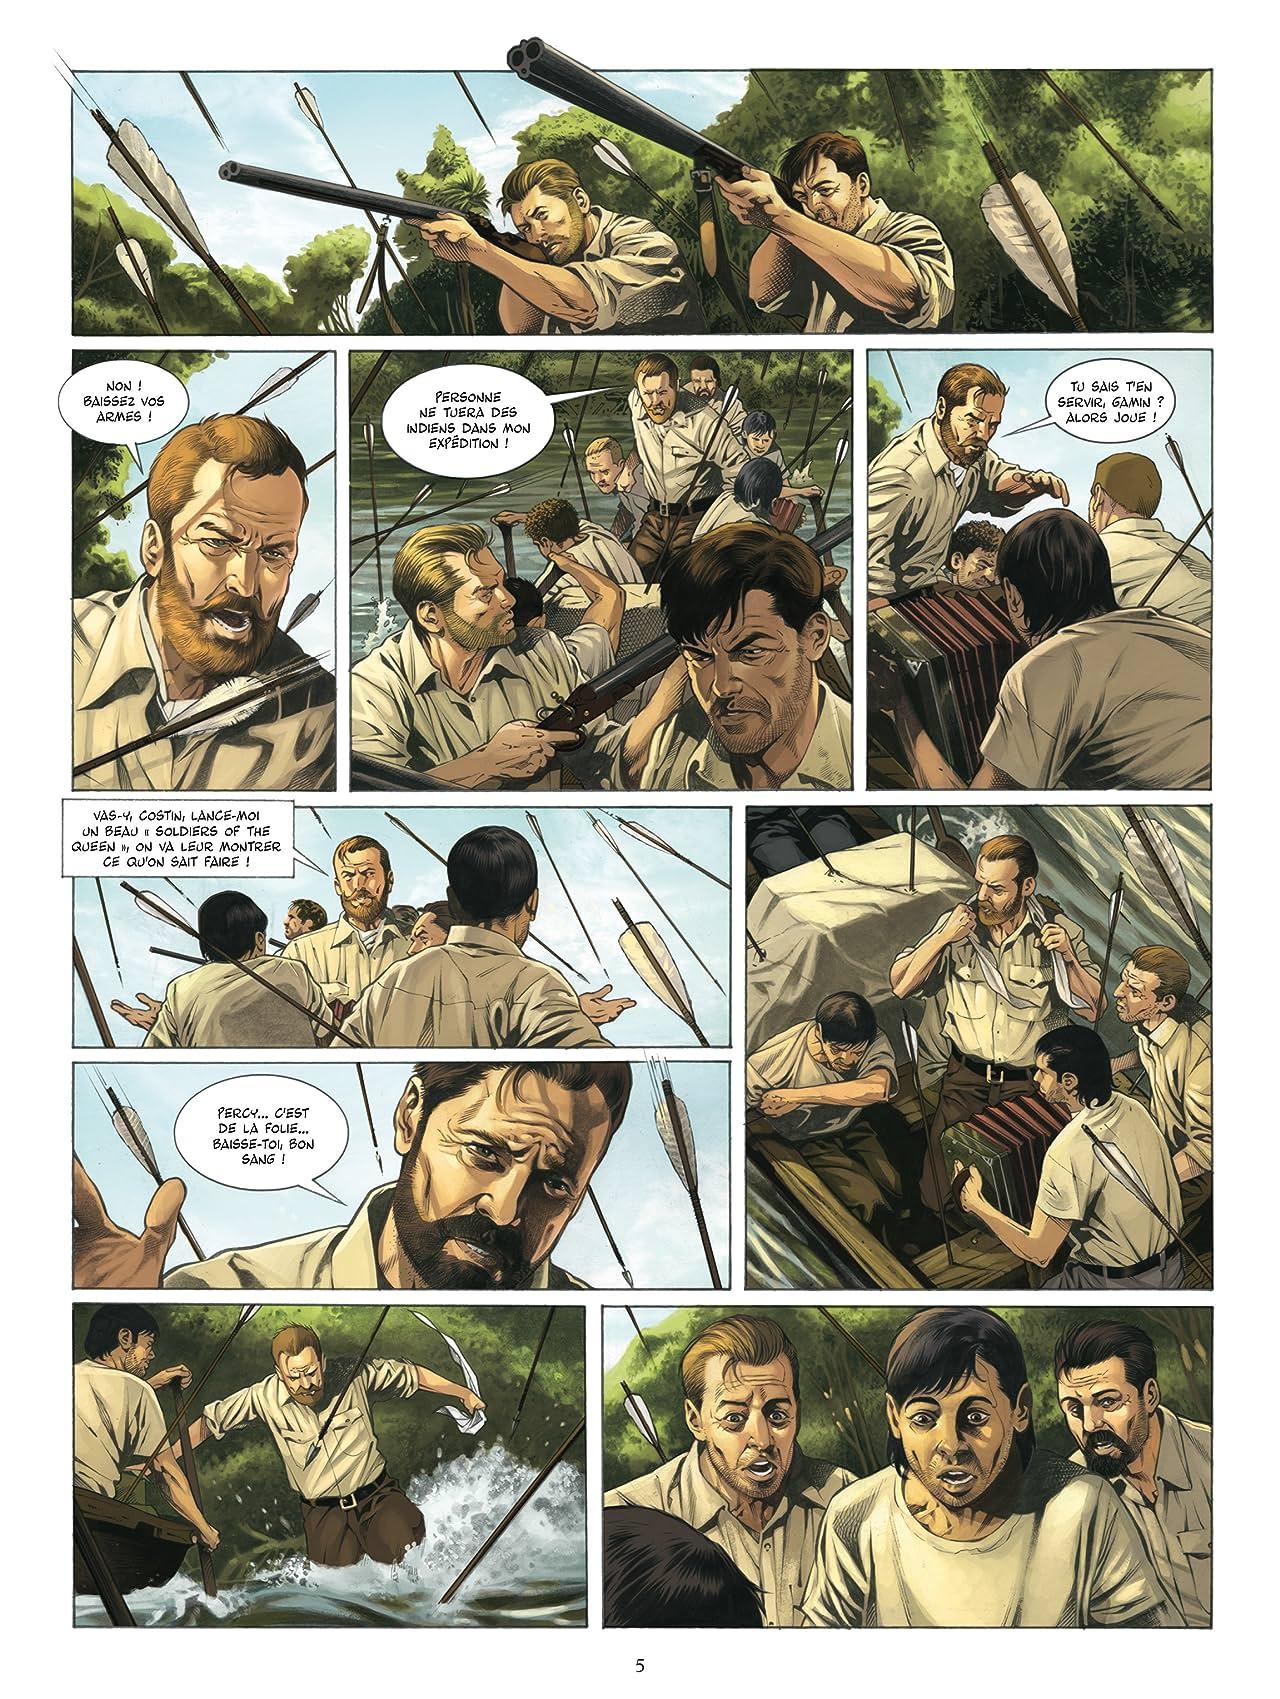 Fawcett Vol. 1: Les cités perdues d'Amazonie